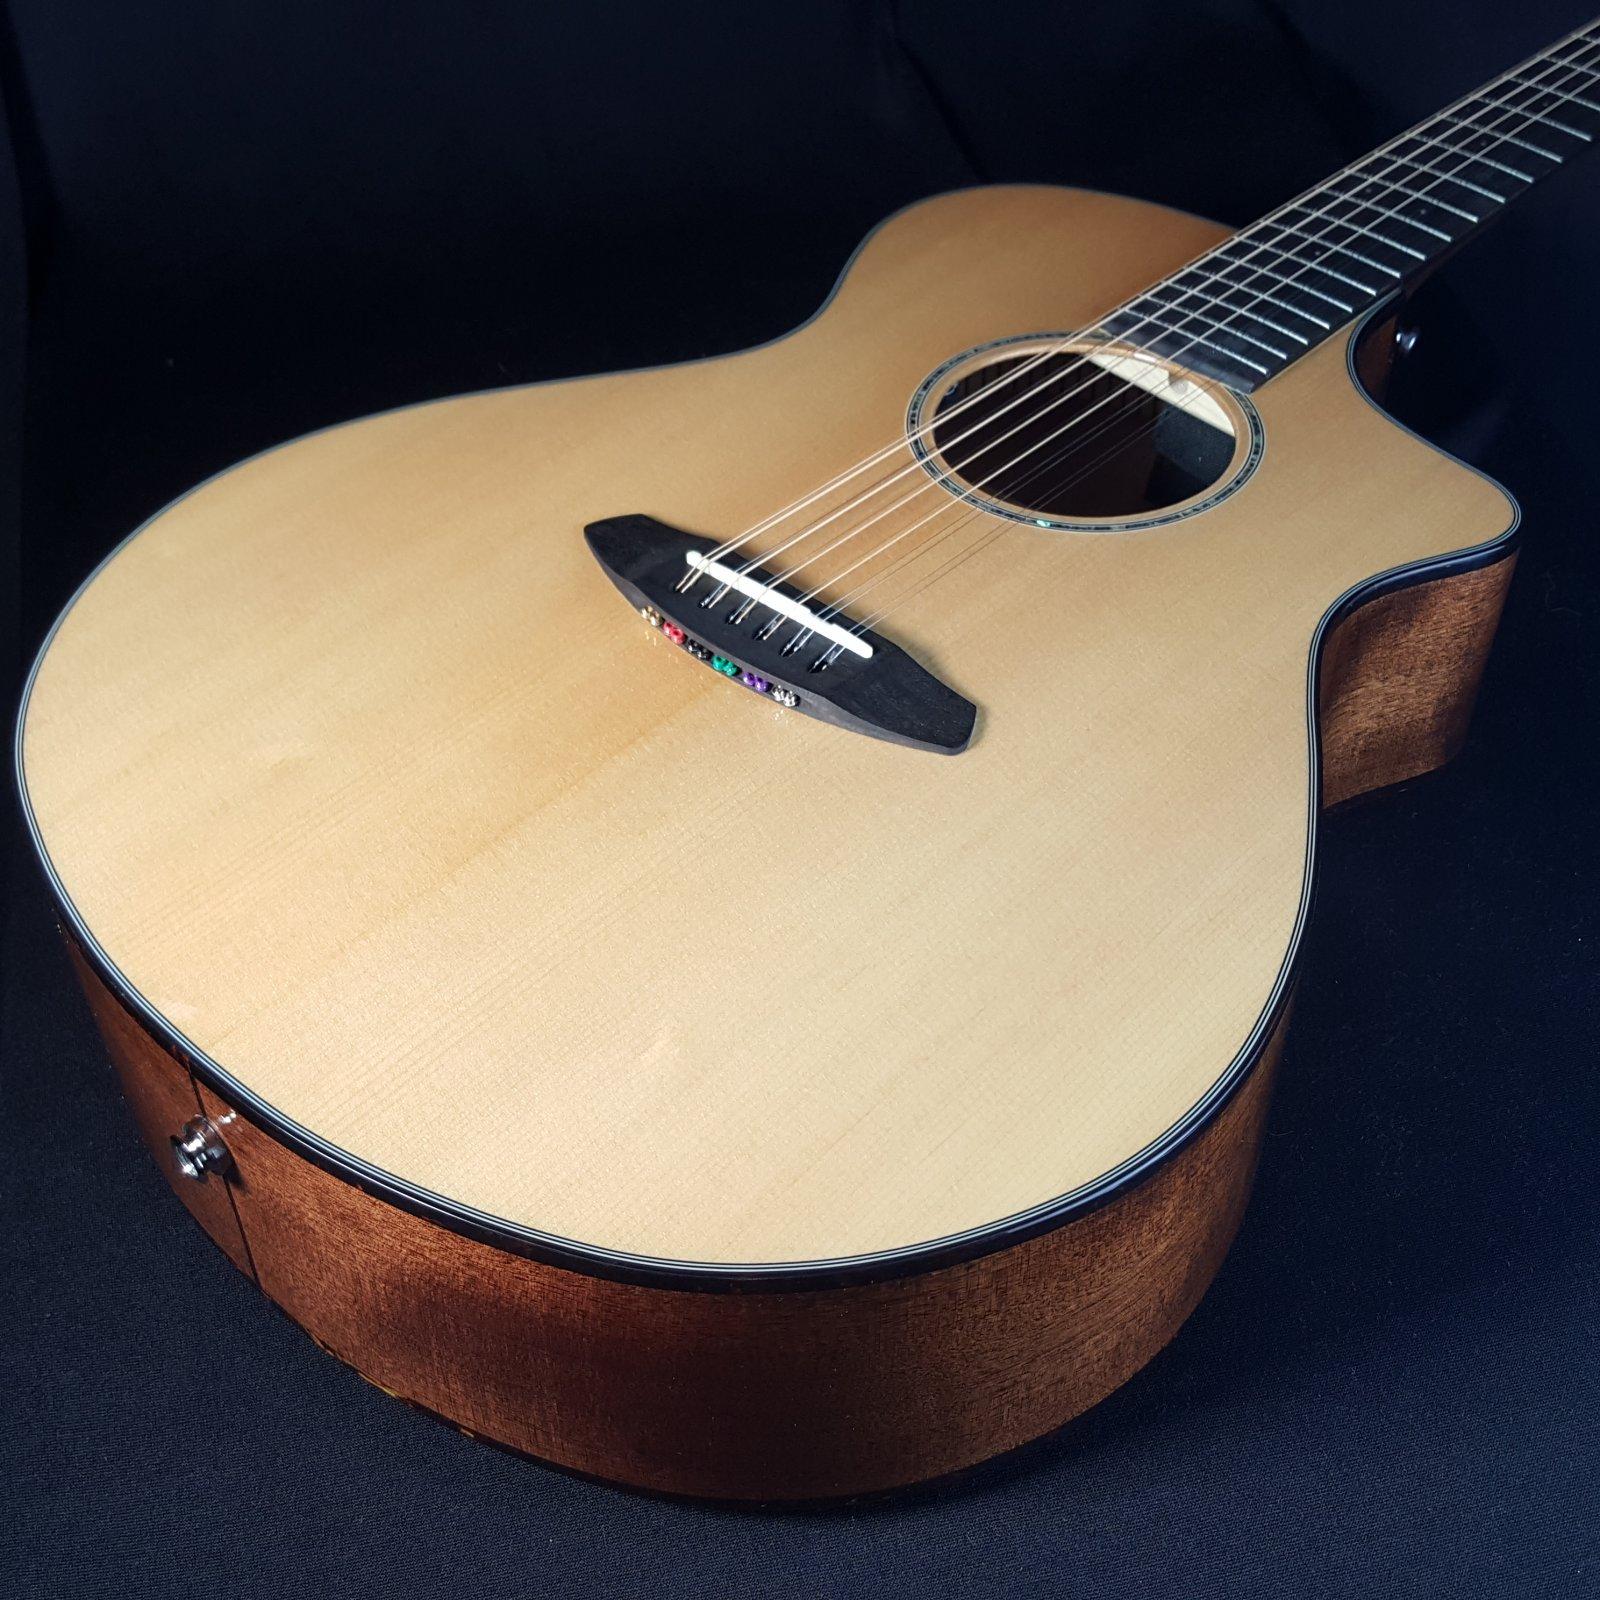 Breedlove Pursuit Concert CE 12-string Acoustic Guitar with Bag